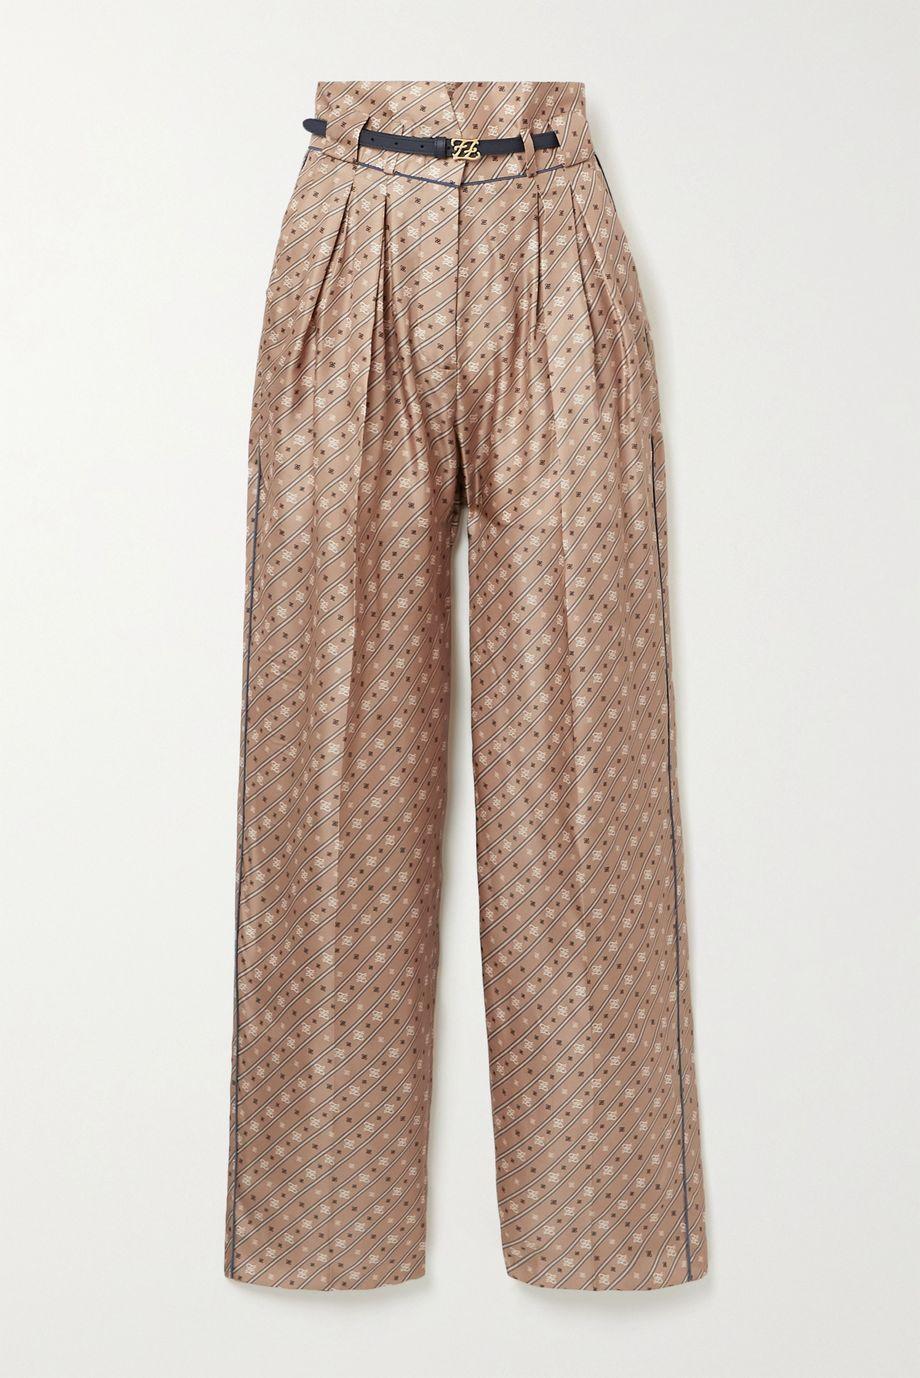 Fendi Belted printed silk-satin twill wide-leg pants